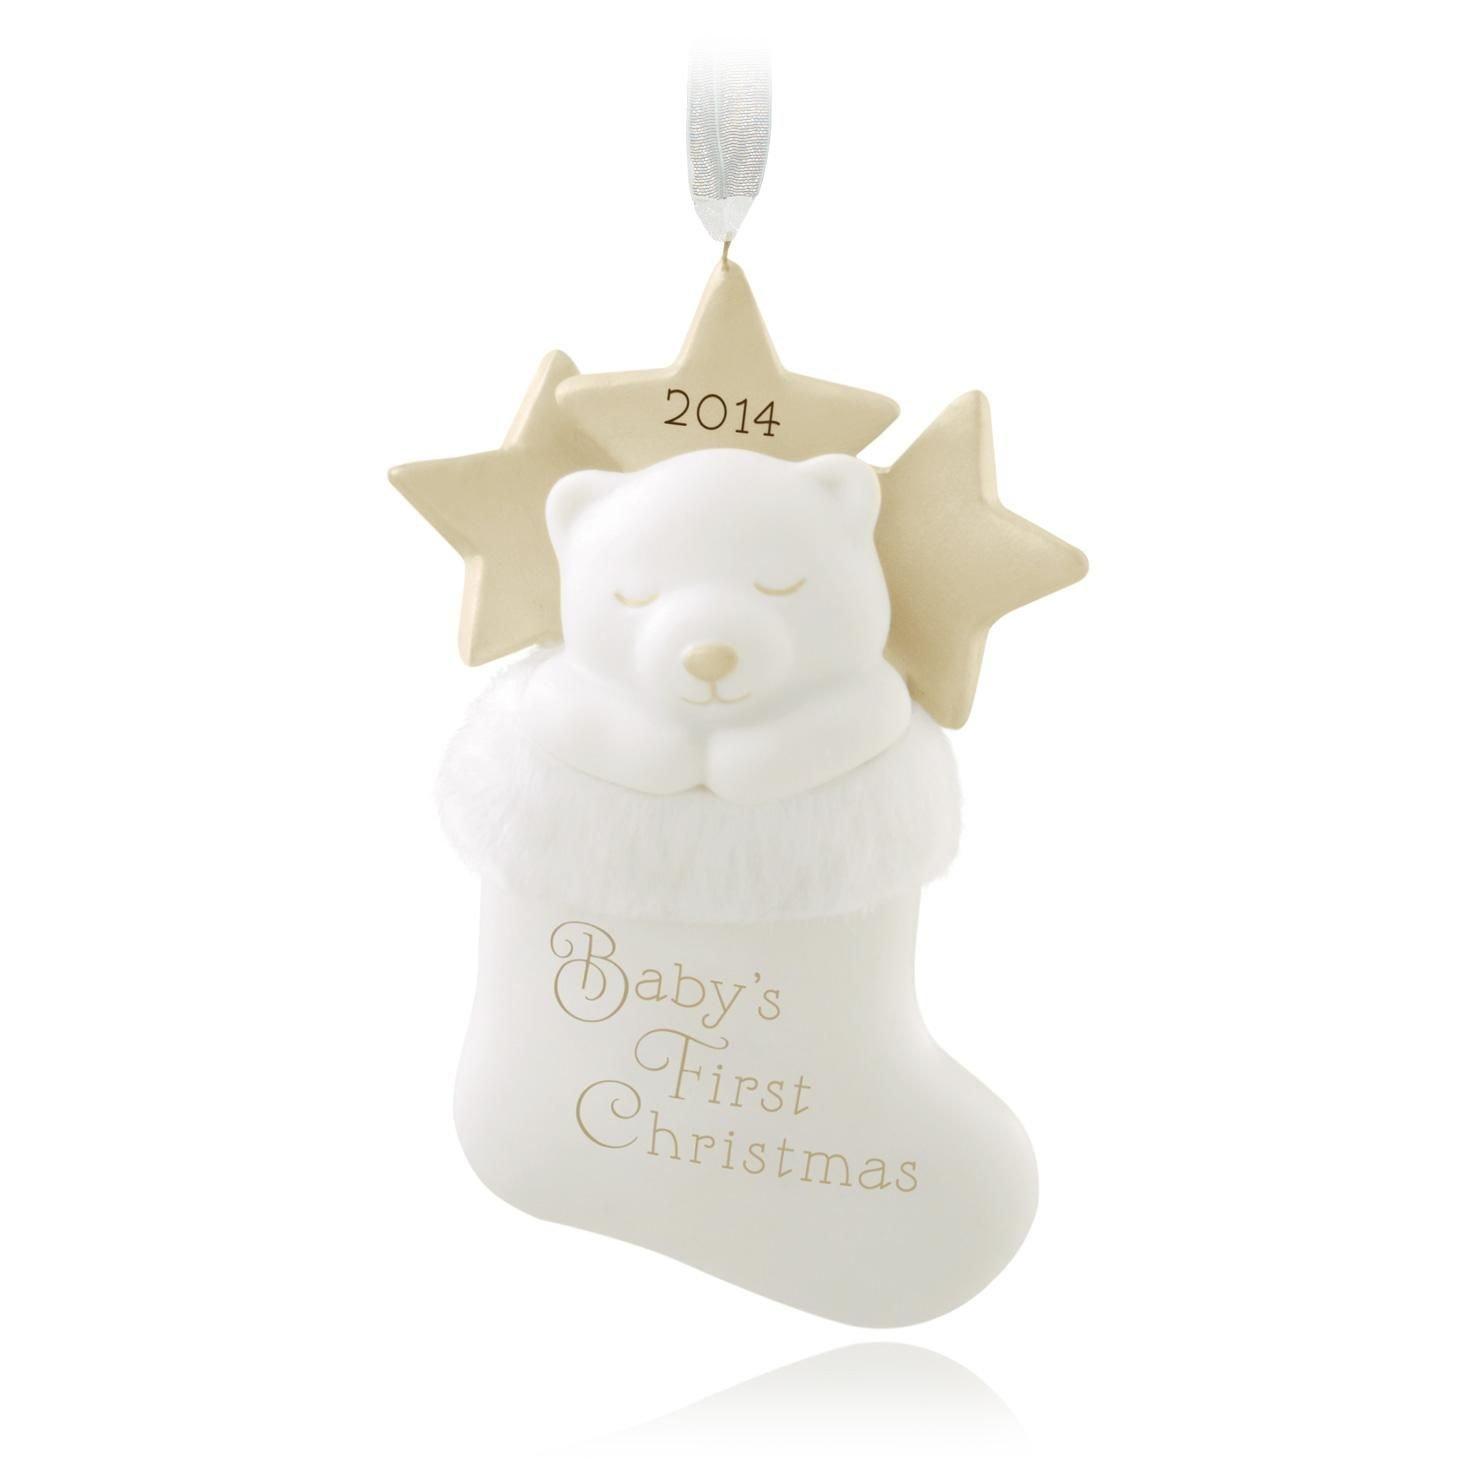 Christening Ornaments Baby Christmas Ornaments: Amazon.com: Baby's First Christmas 2012 Hallmark Ornament